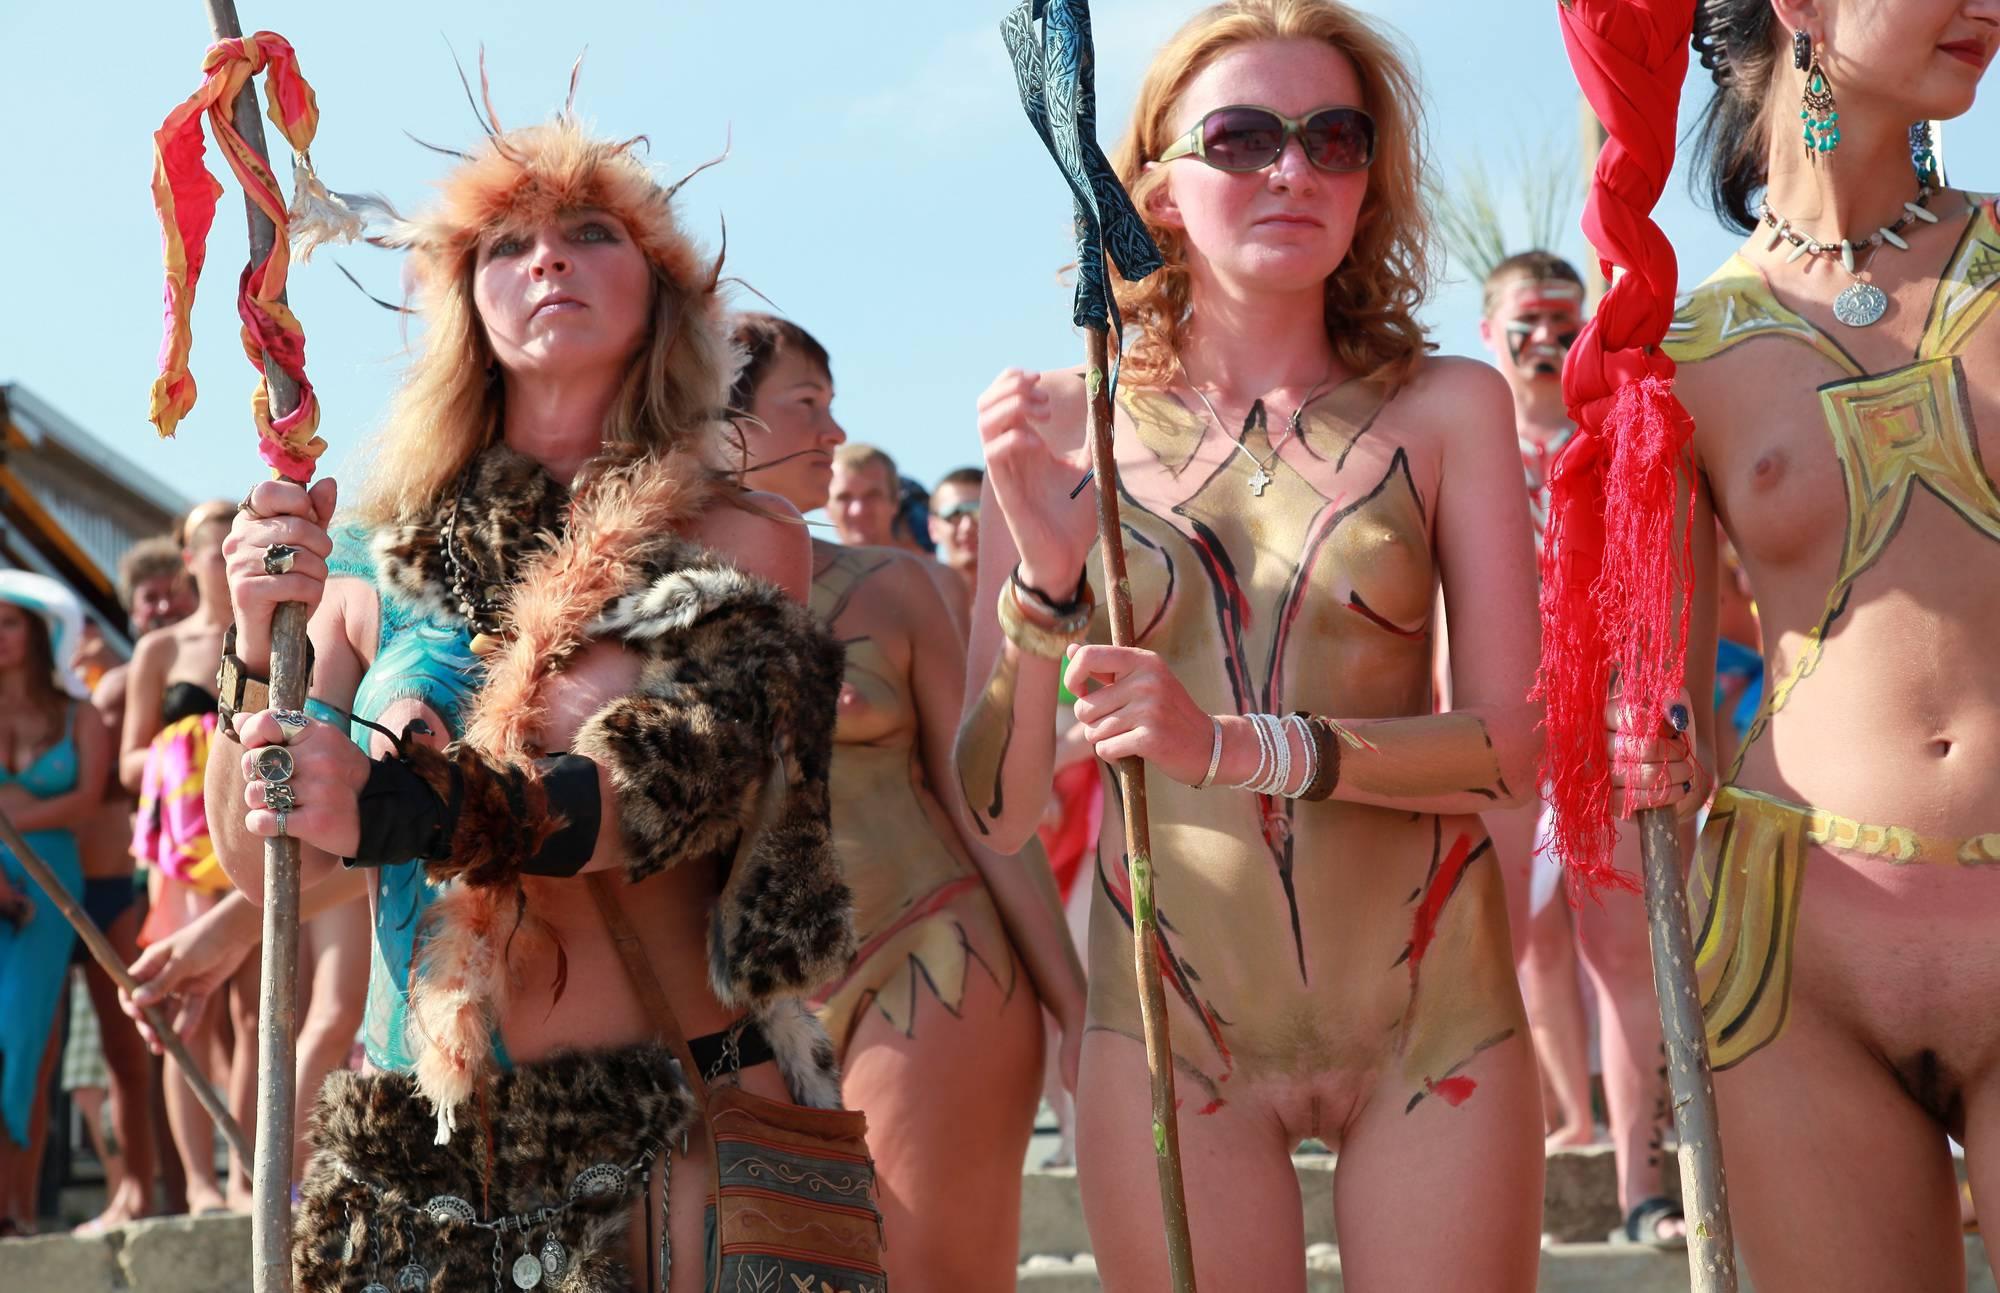 Nudist Gallery Neptune Odessa Groups - 2